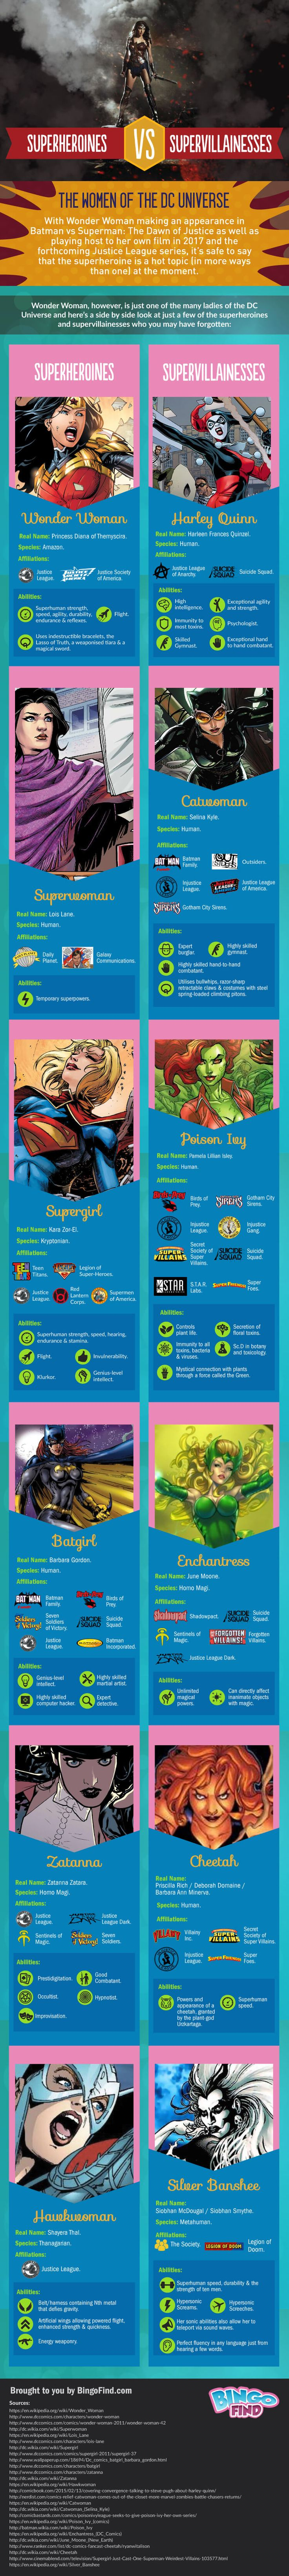 Superheroines vs Supervillainesses: The Women of the DC Universe #Infographic #Entertainment